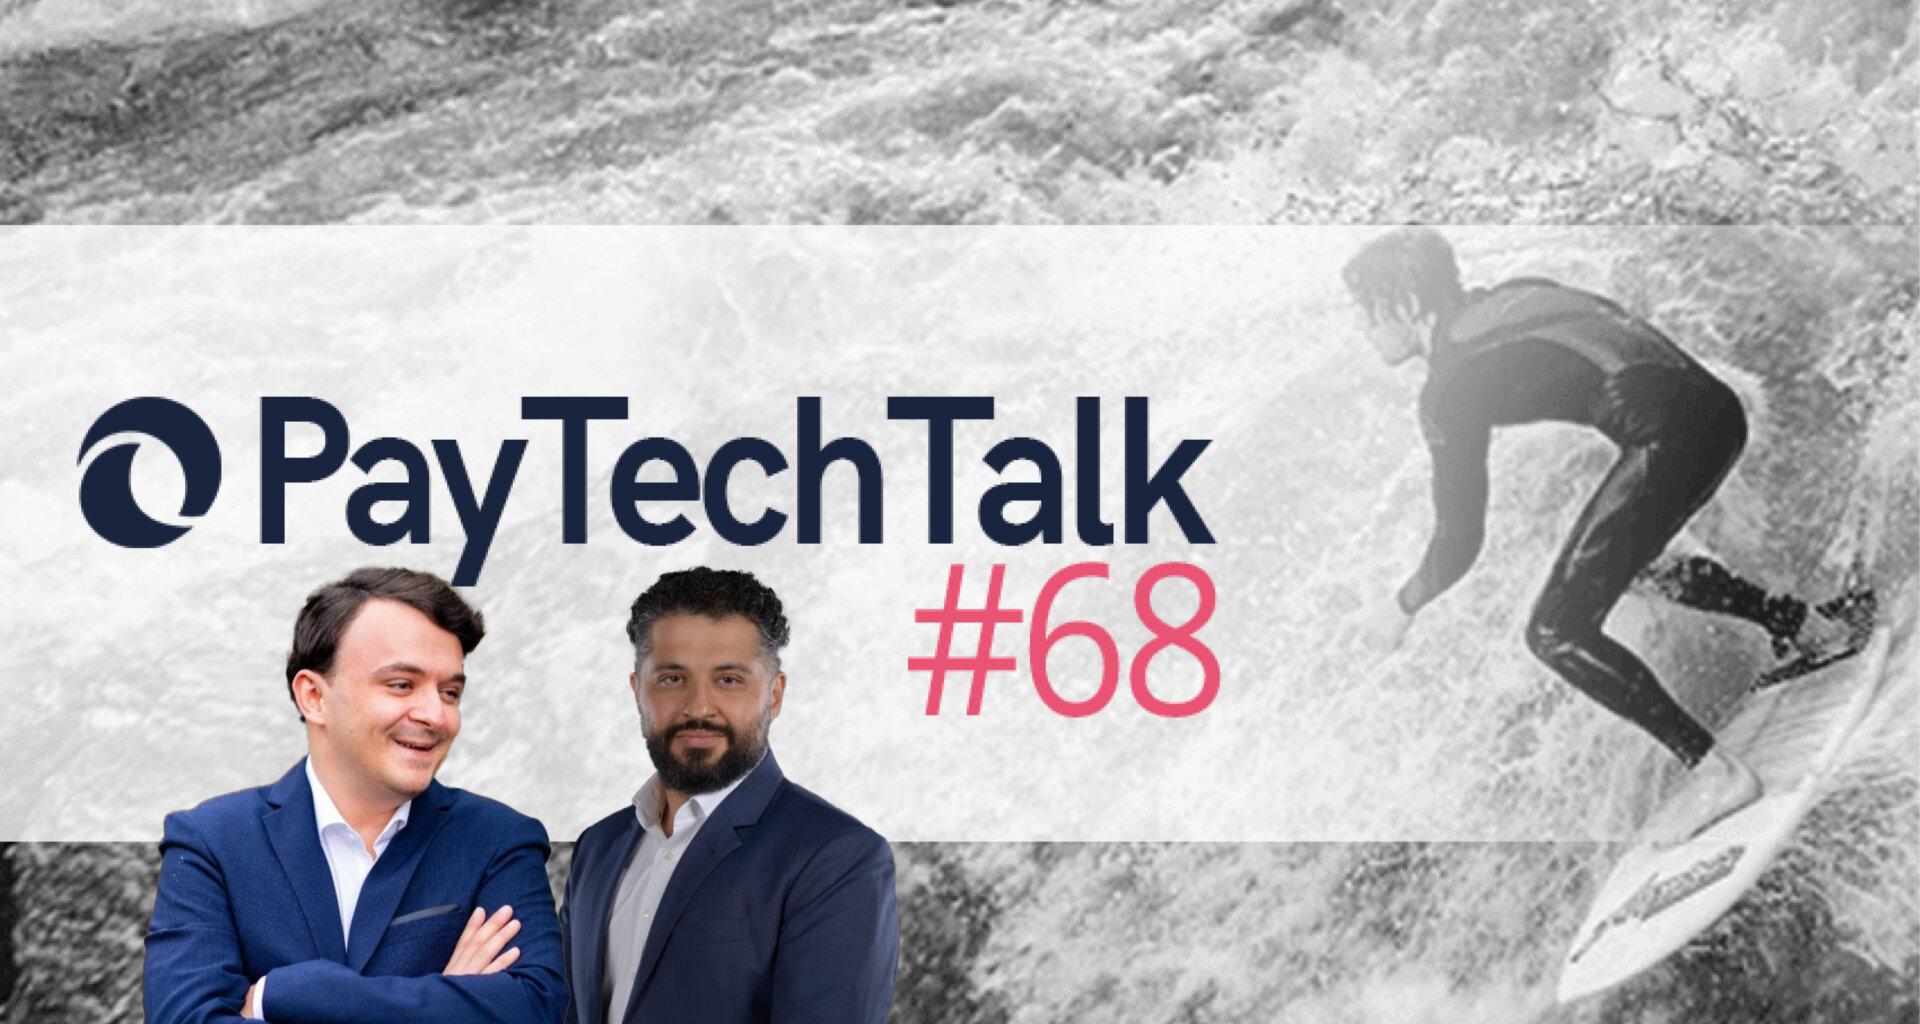 PayTechTalk 68 | PayTechLaw | PayTechTalk#68 - Bitcoin, DeFi, AMLD6 & MiCAR